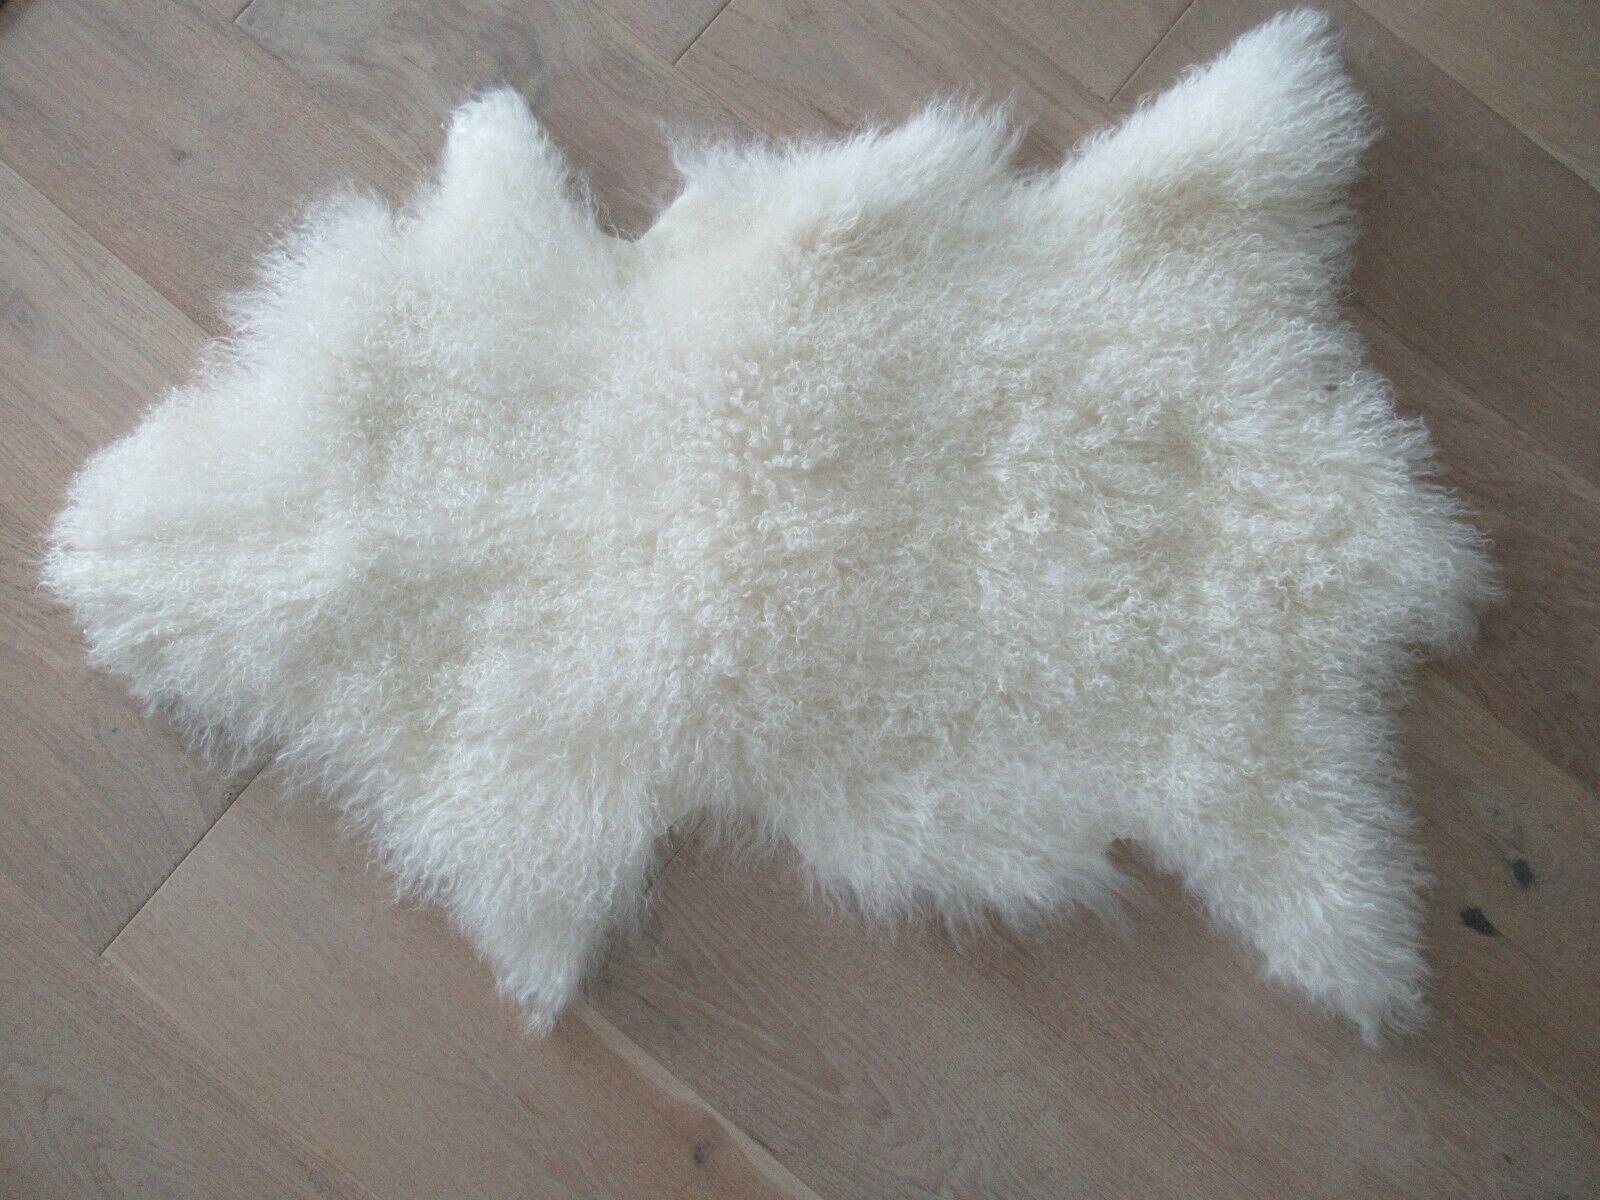 Curly Mongolian White Fur Bear Faux Fur Teddy Briette the Mongolian Artist Bear Nursery Gift Curly Lamb Fur Artist Bear Ready to Ship